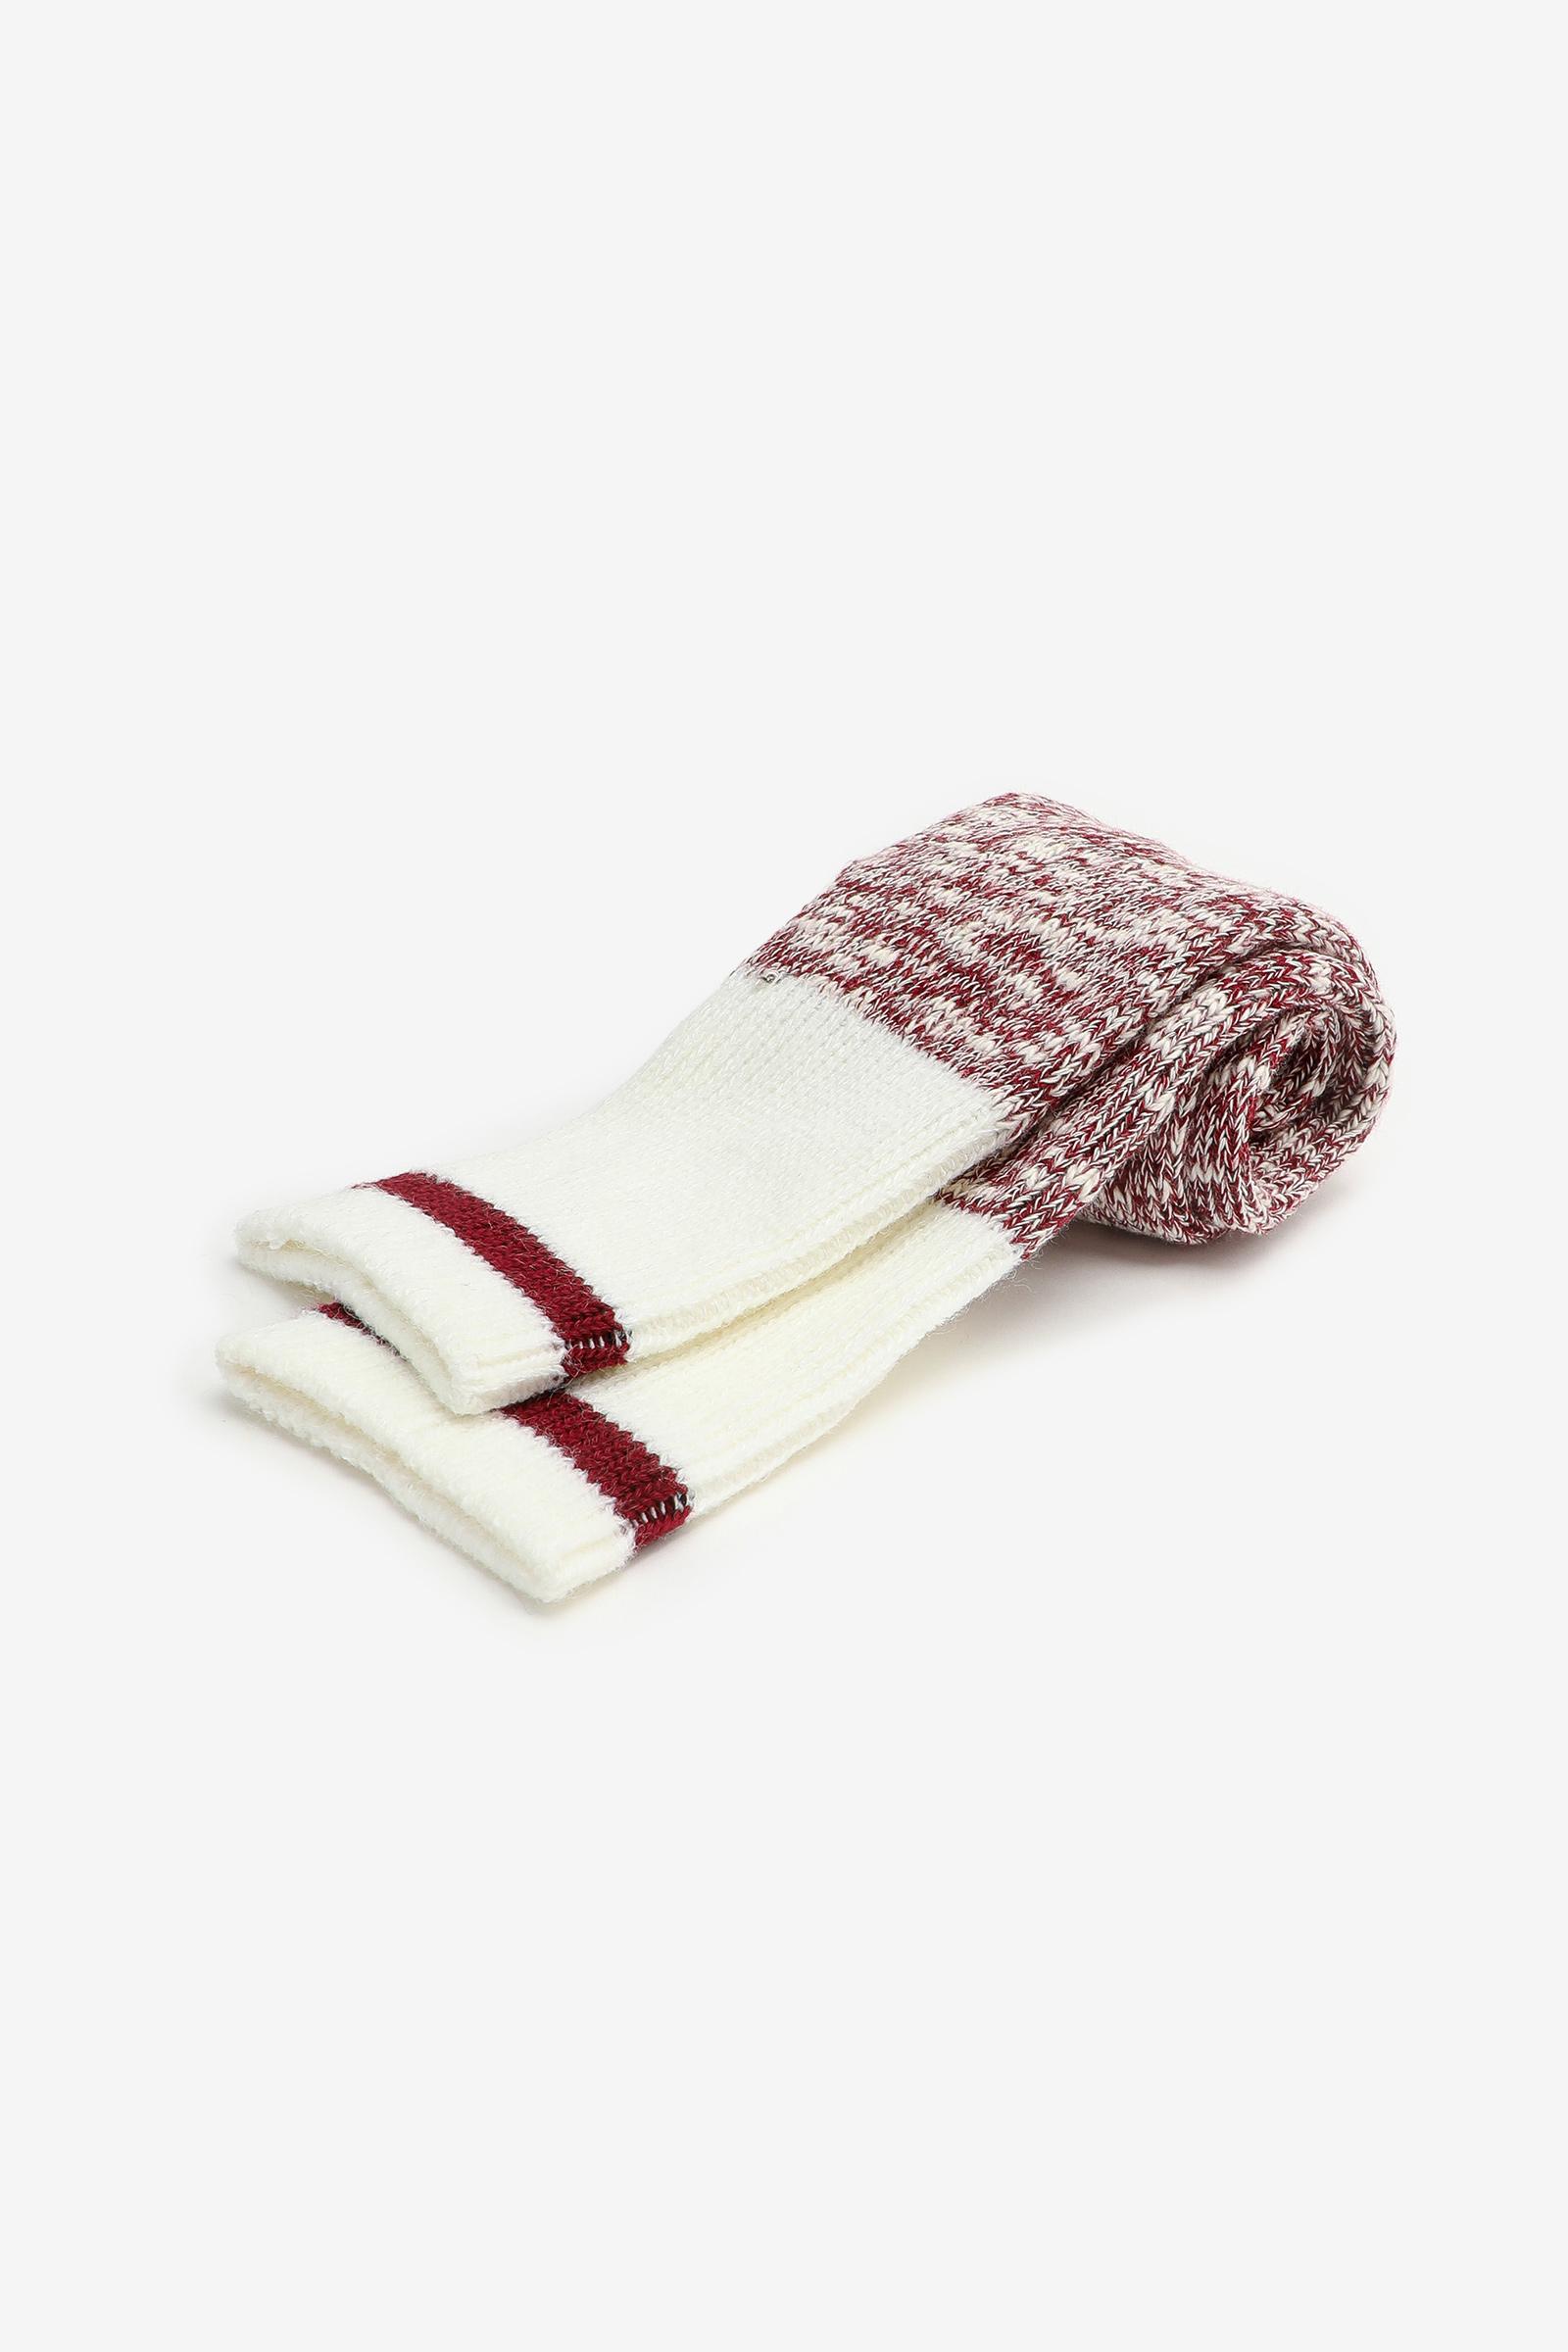 Cabin Style Socks